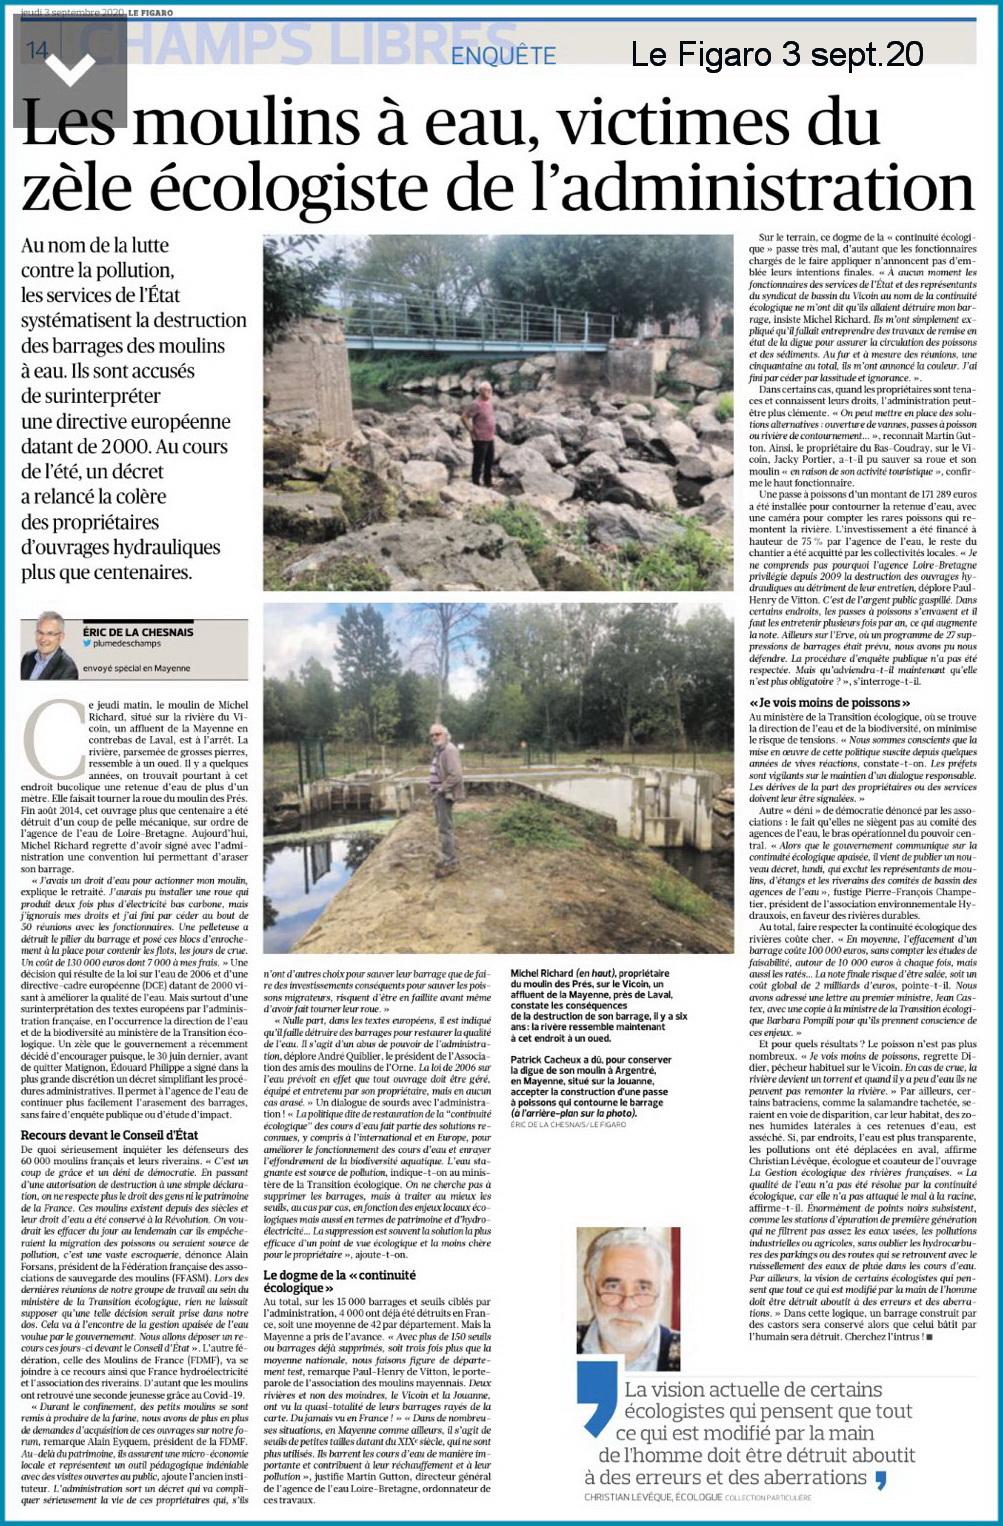 Le Figaro sept.20